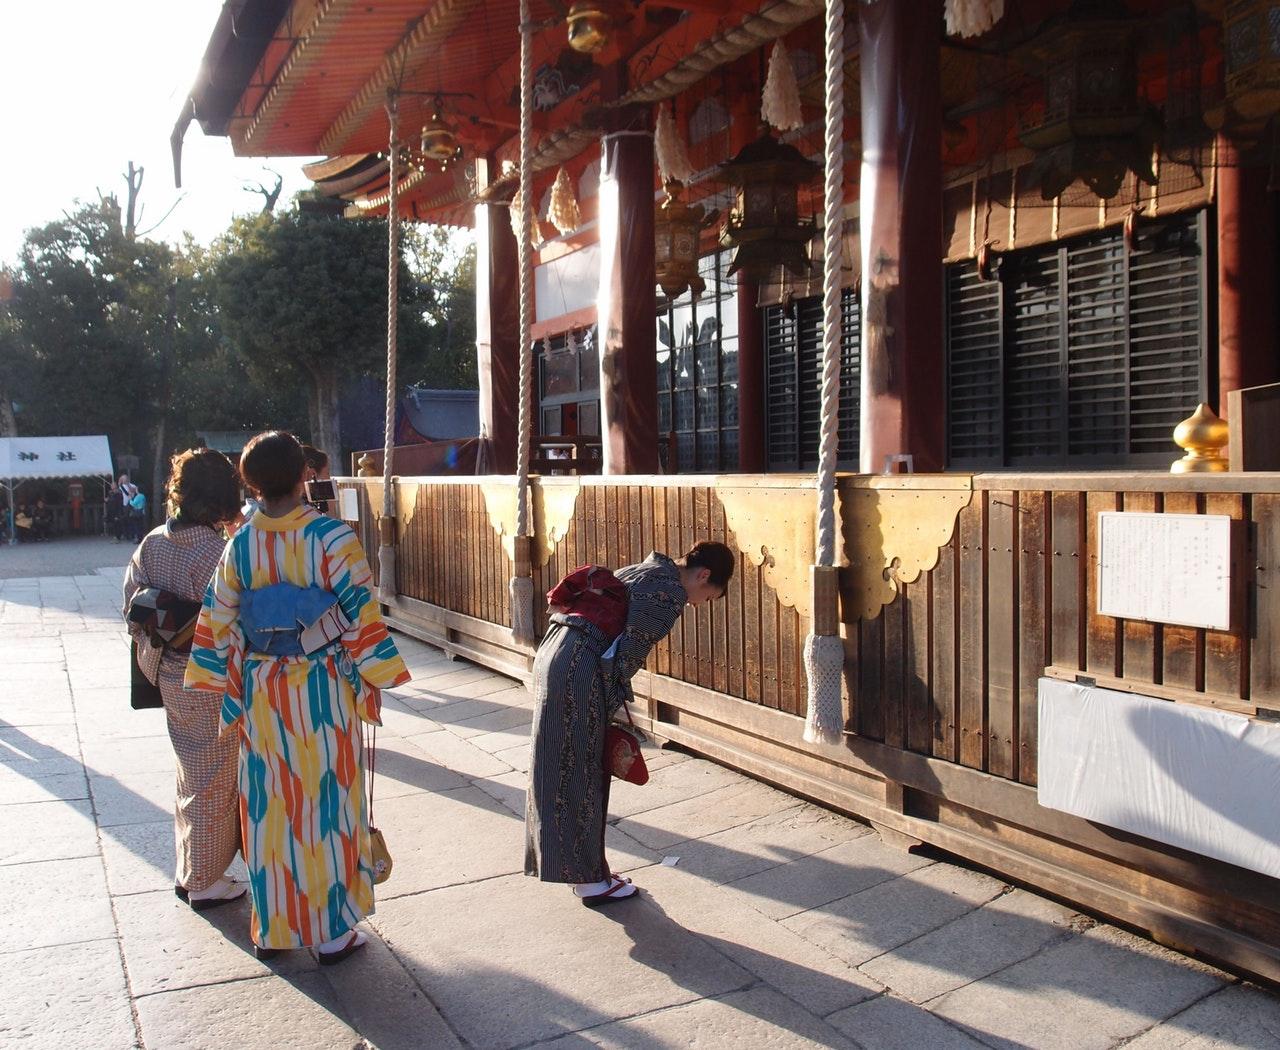 kyoto-kyoto-japan-1086814.jpg